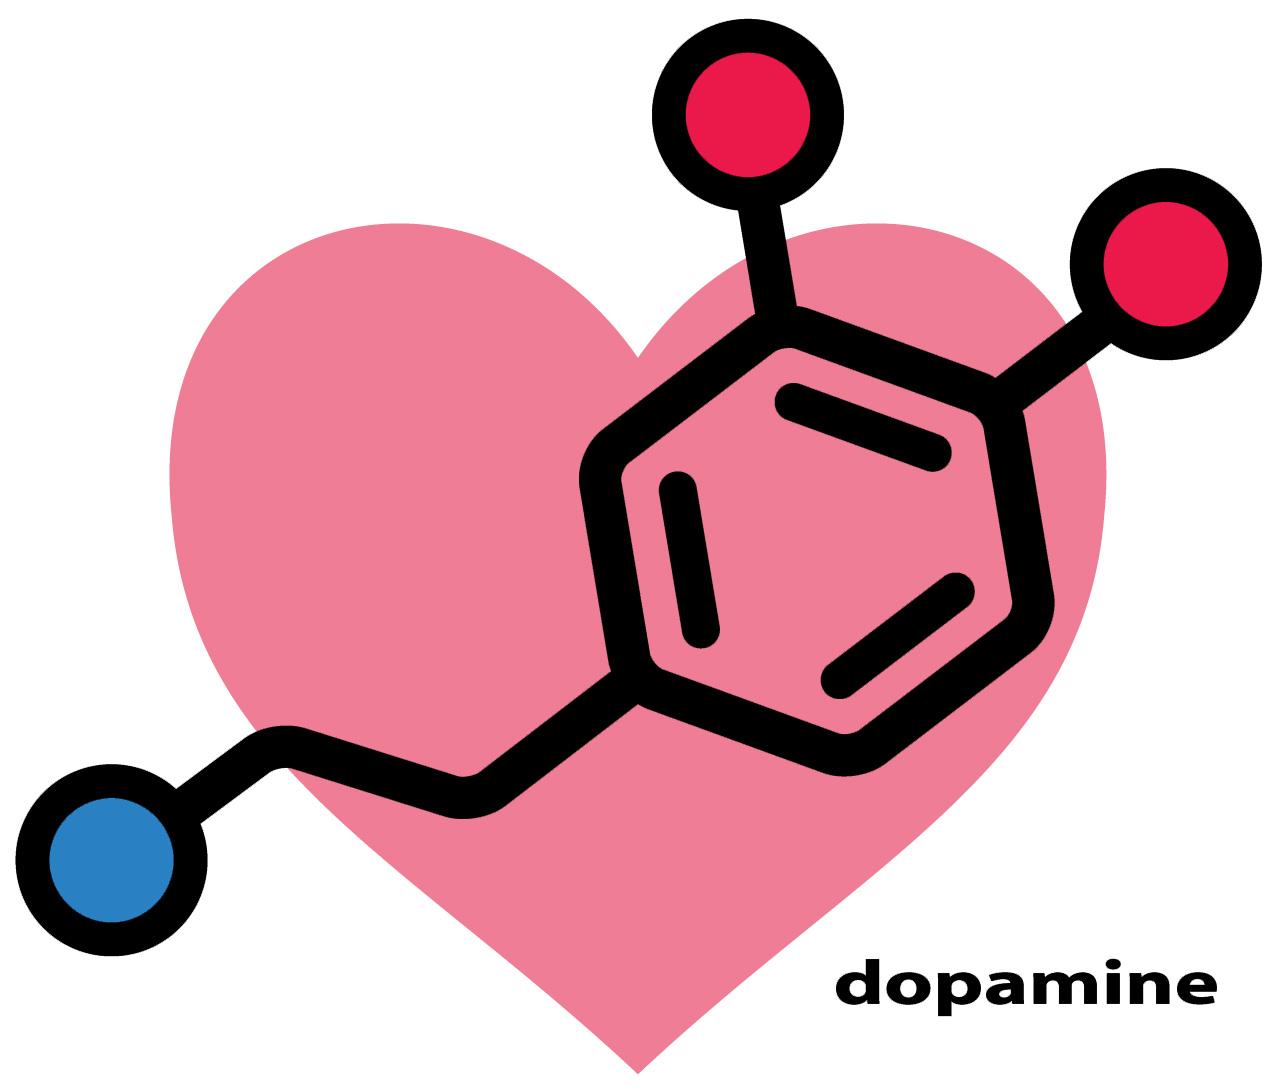 valentines-4-dopamine-heart.jpg